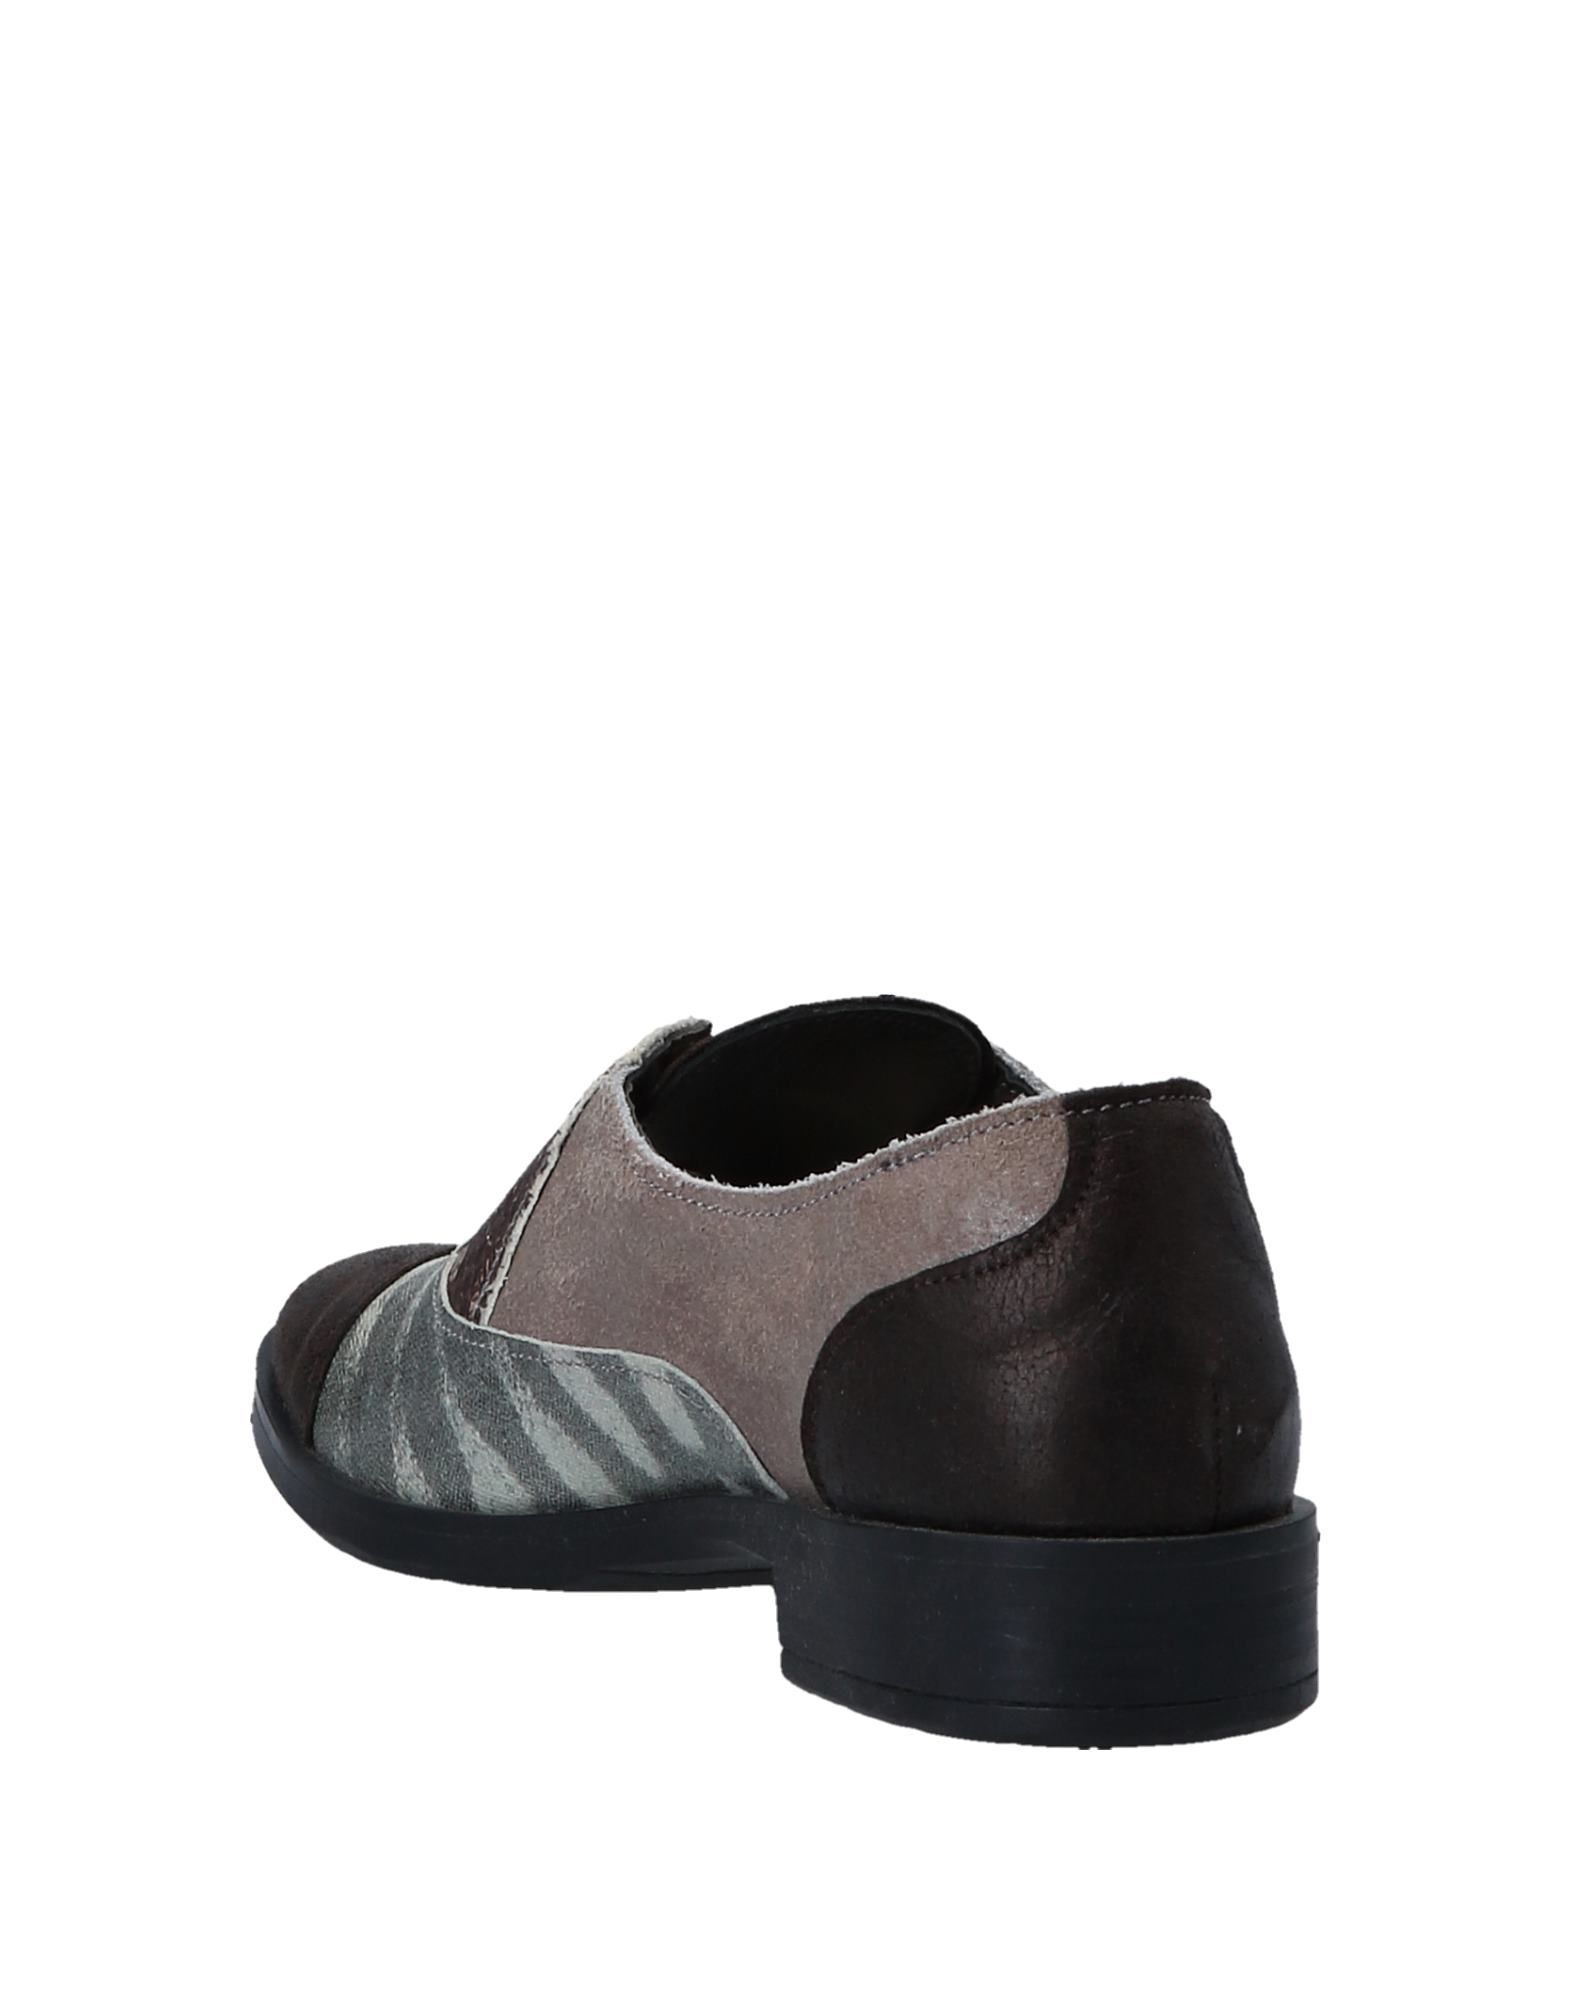 Ebarrito Gute Mokassins Damen  11554531VO Gute Ebarrito Qualität beliebte Schuhe 5616c1